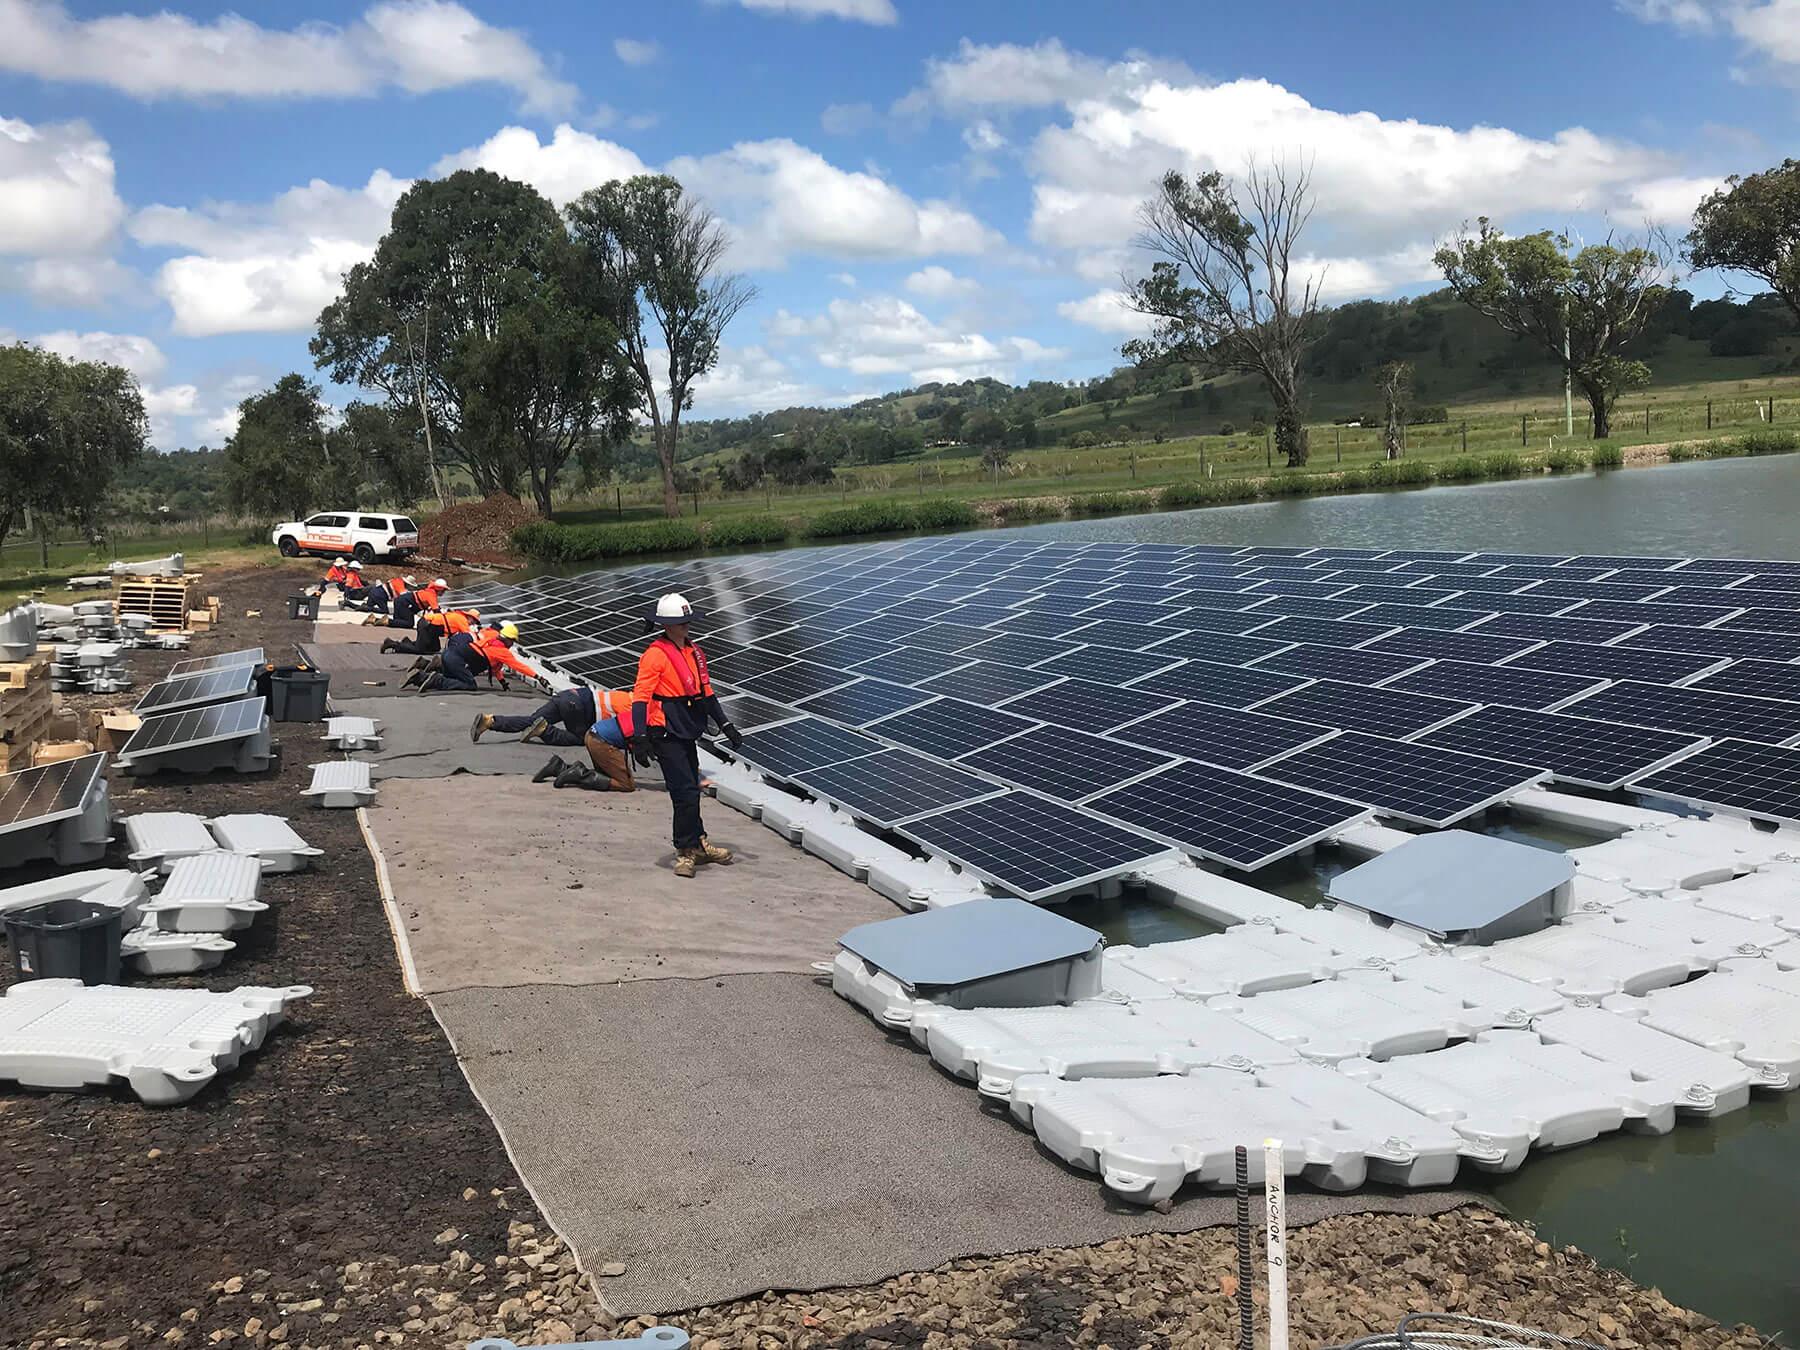 cirtex-anchors-solar-panels